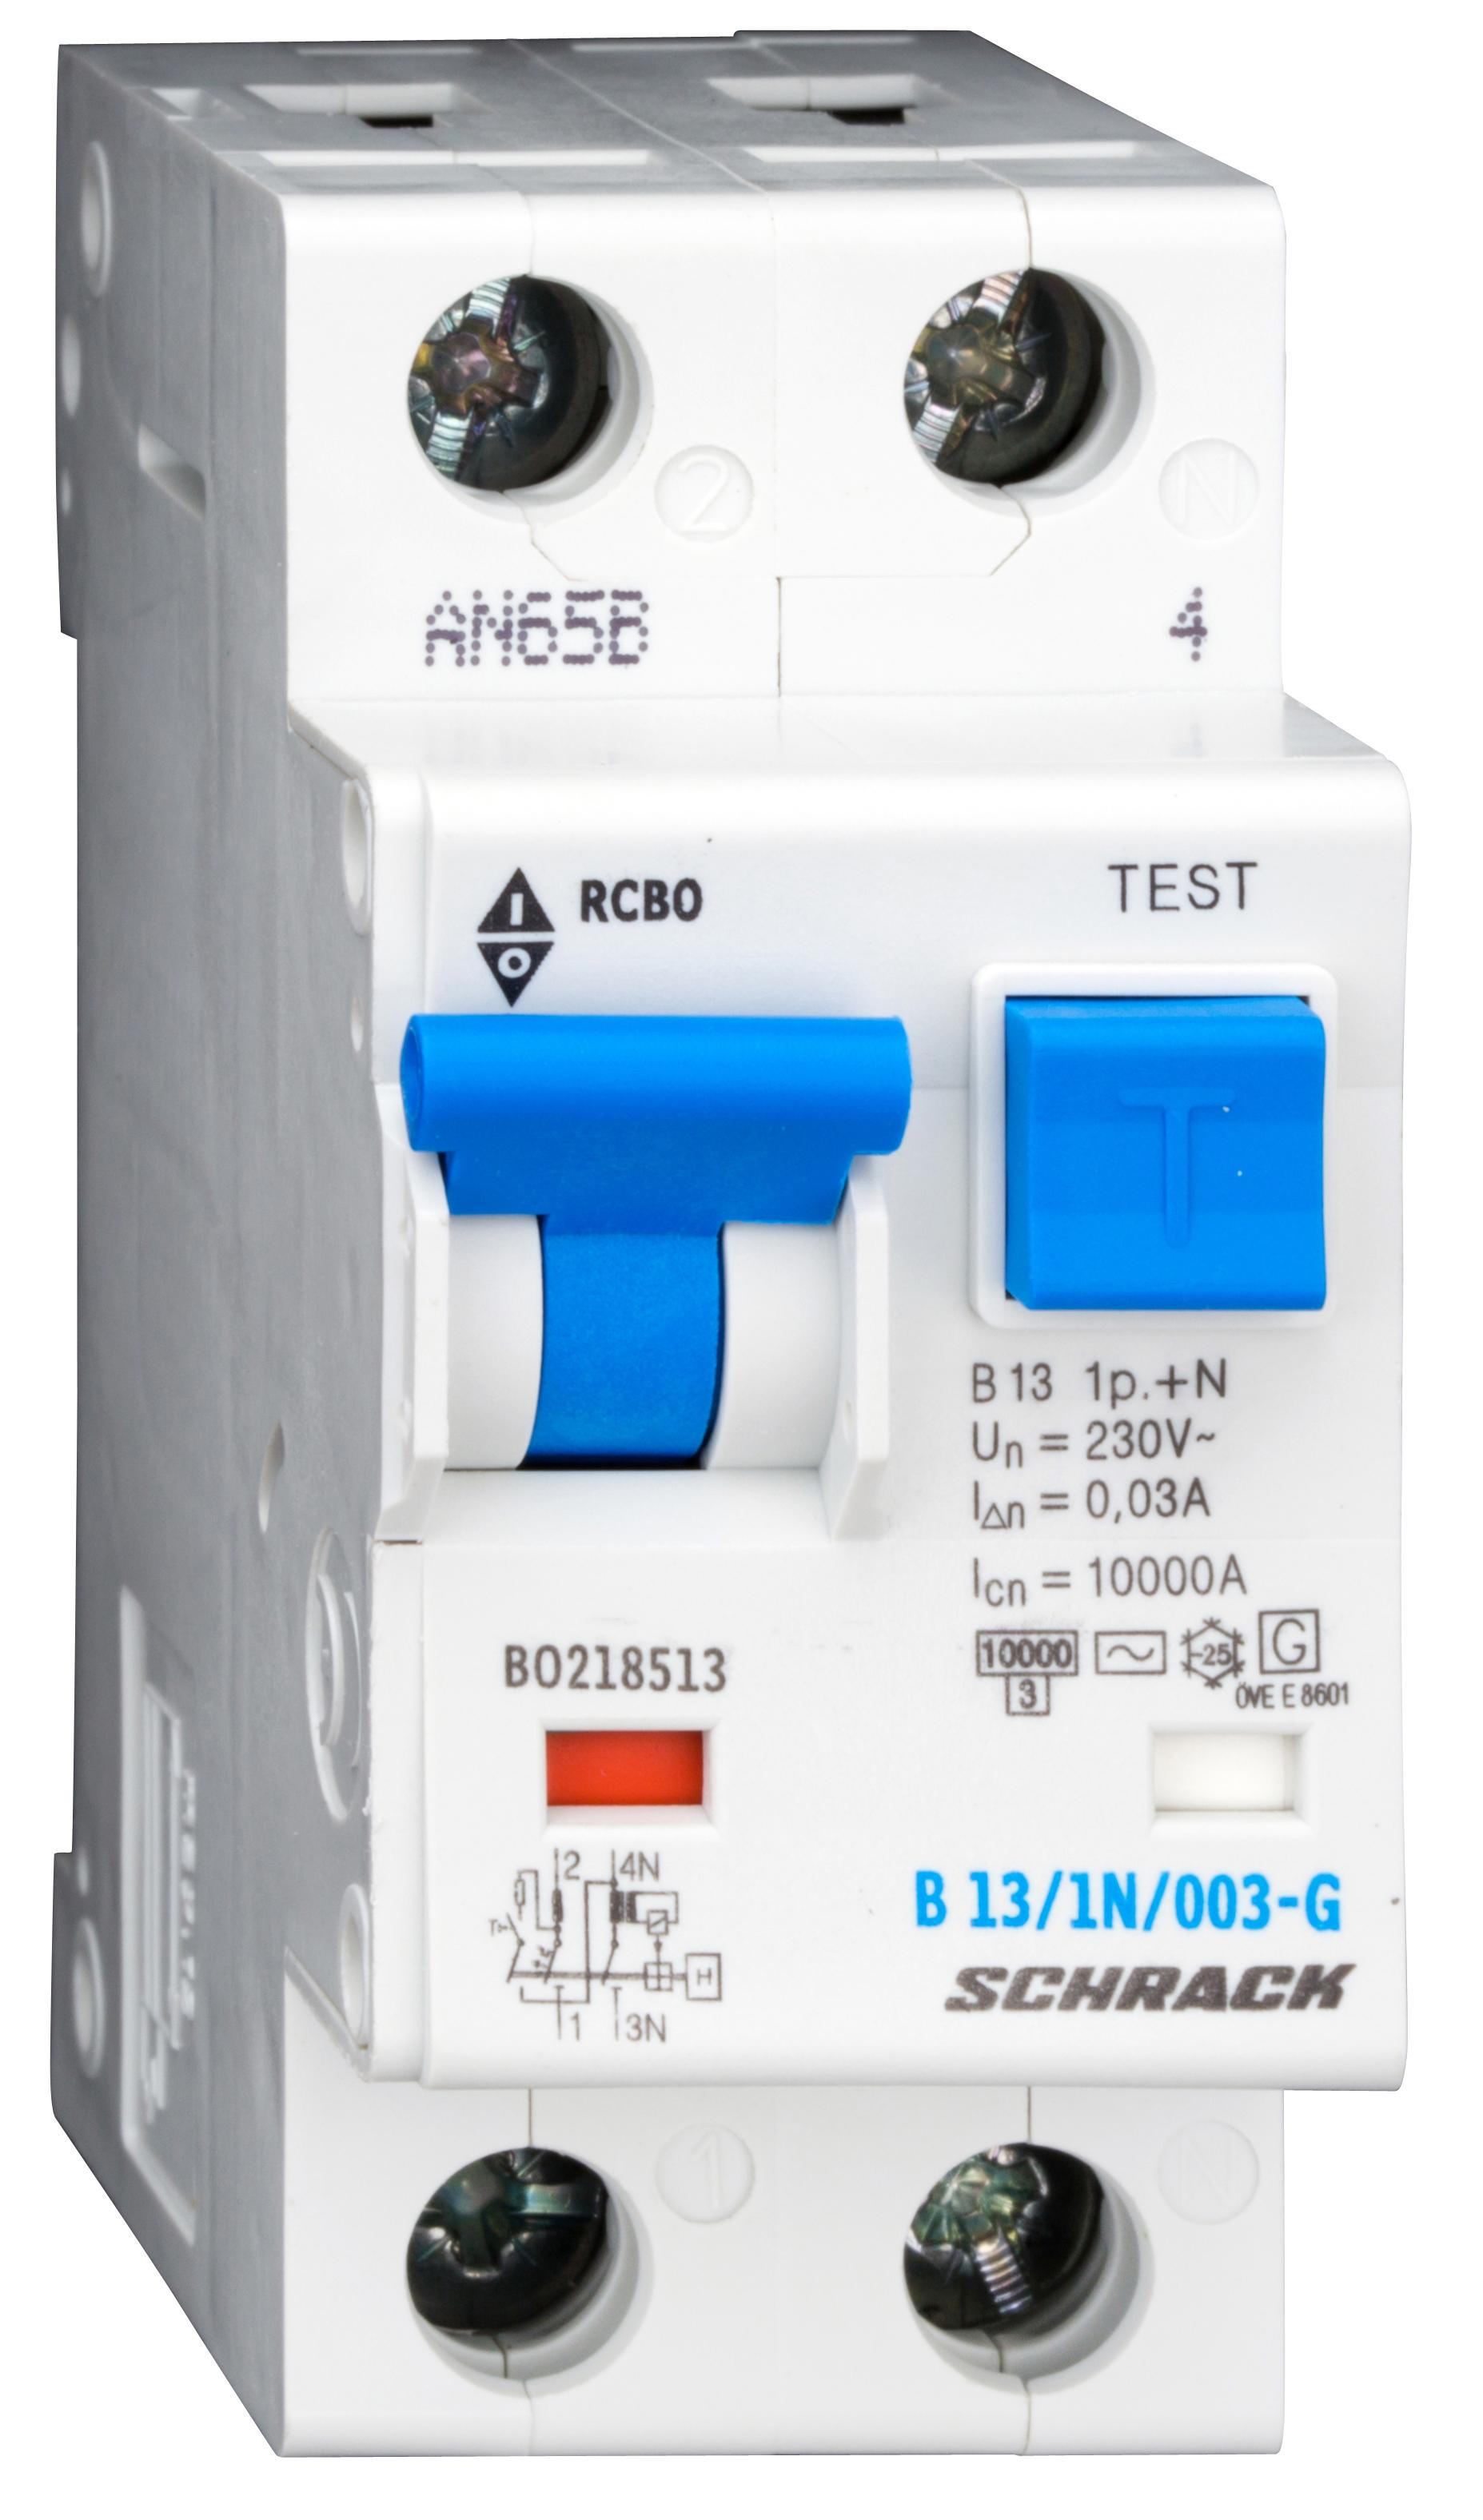 1 Stk LS-FI-Schalter,Kennl. B,13A,30mA,1-polig+N, Bauart G,Typ AC BO218513--